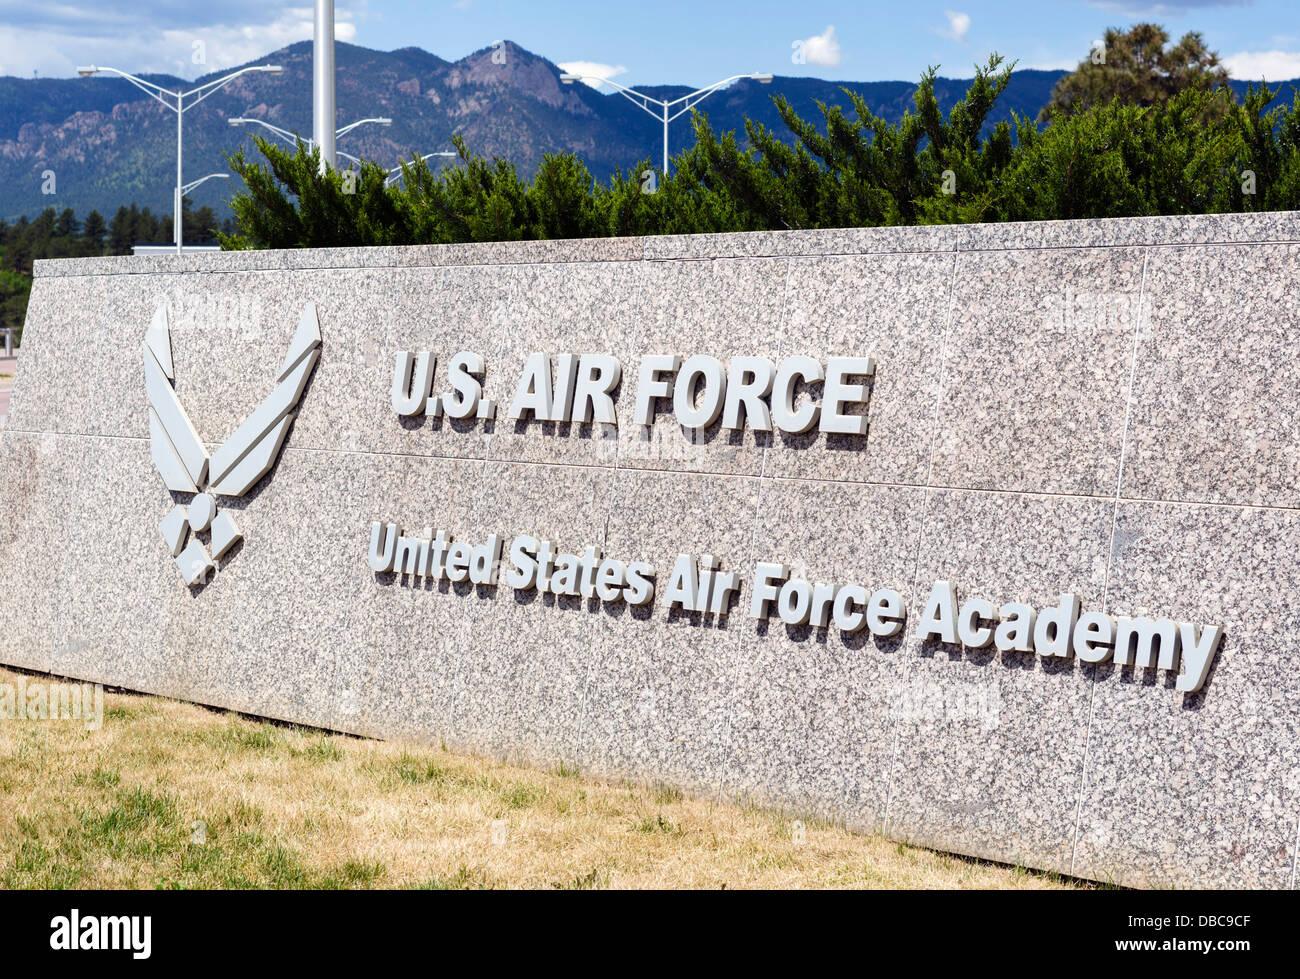 Eintritt in die United States Air Force Academy in Colorado Springs, Colorado, USA Stockbild